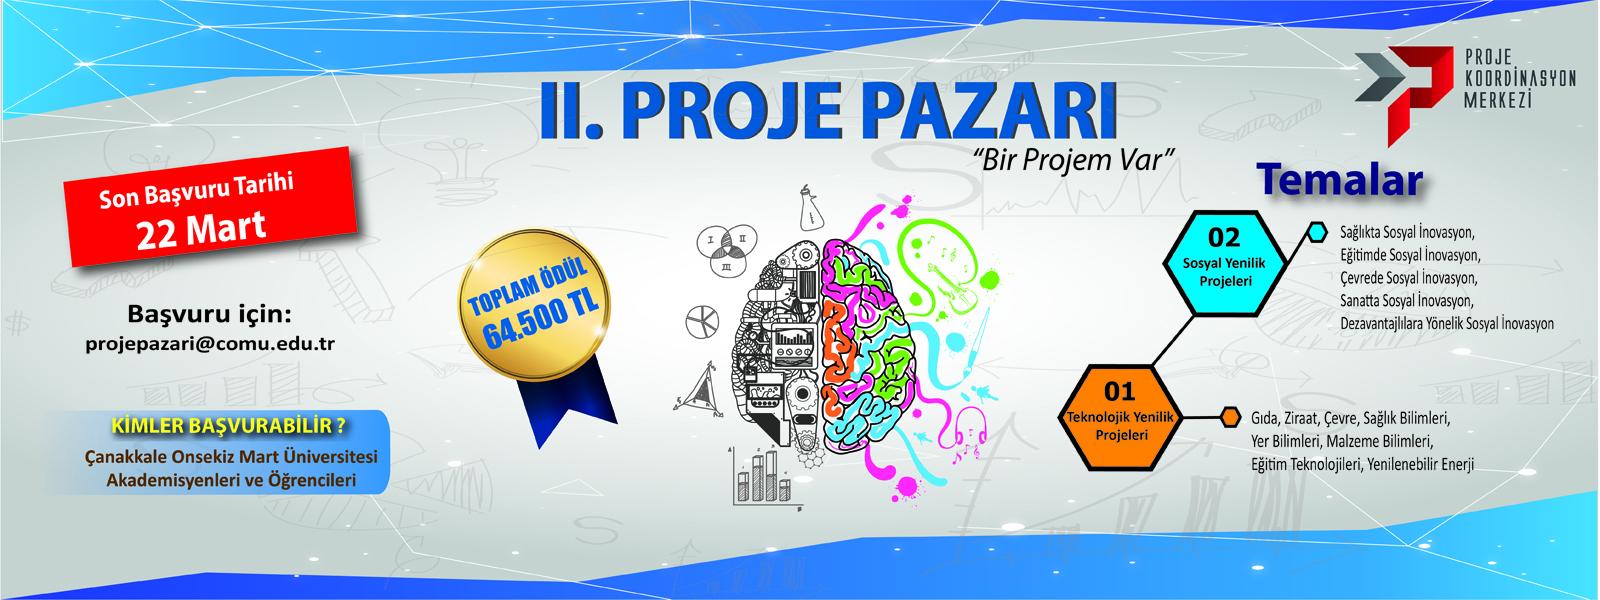 2. Proje Pazarı